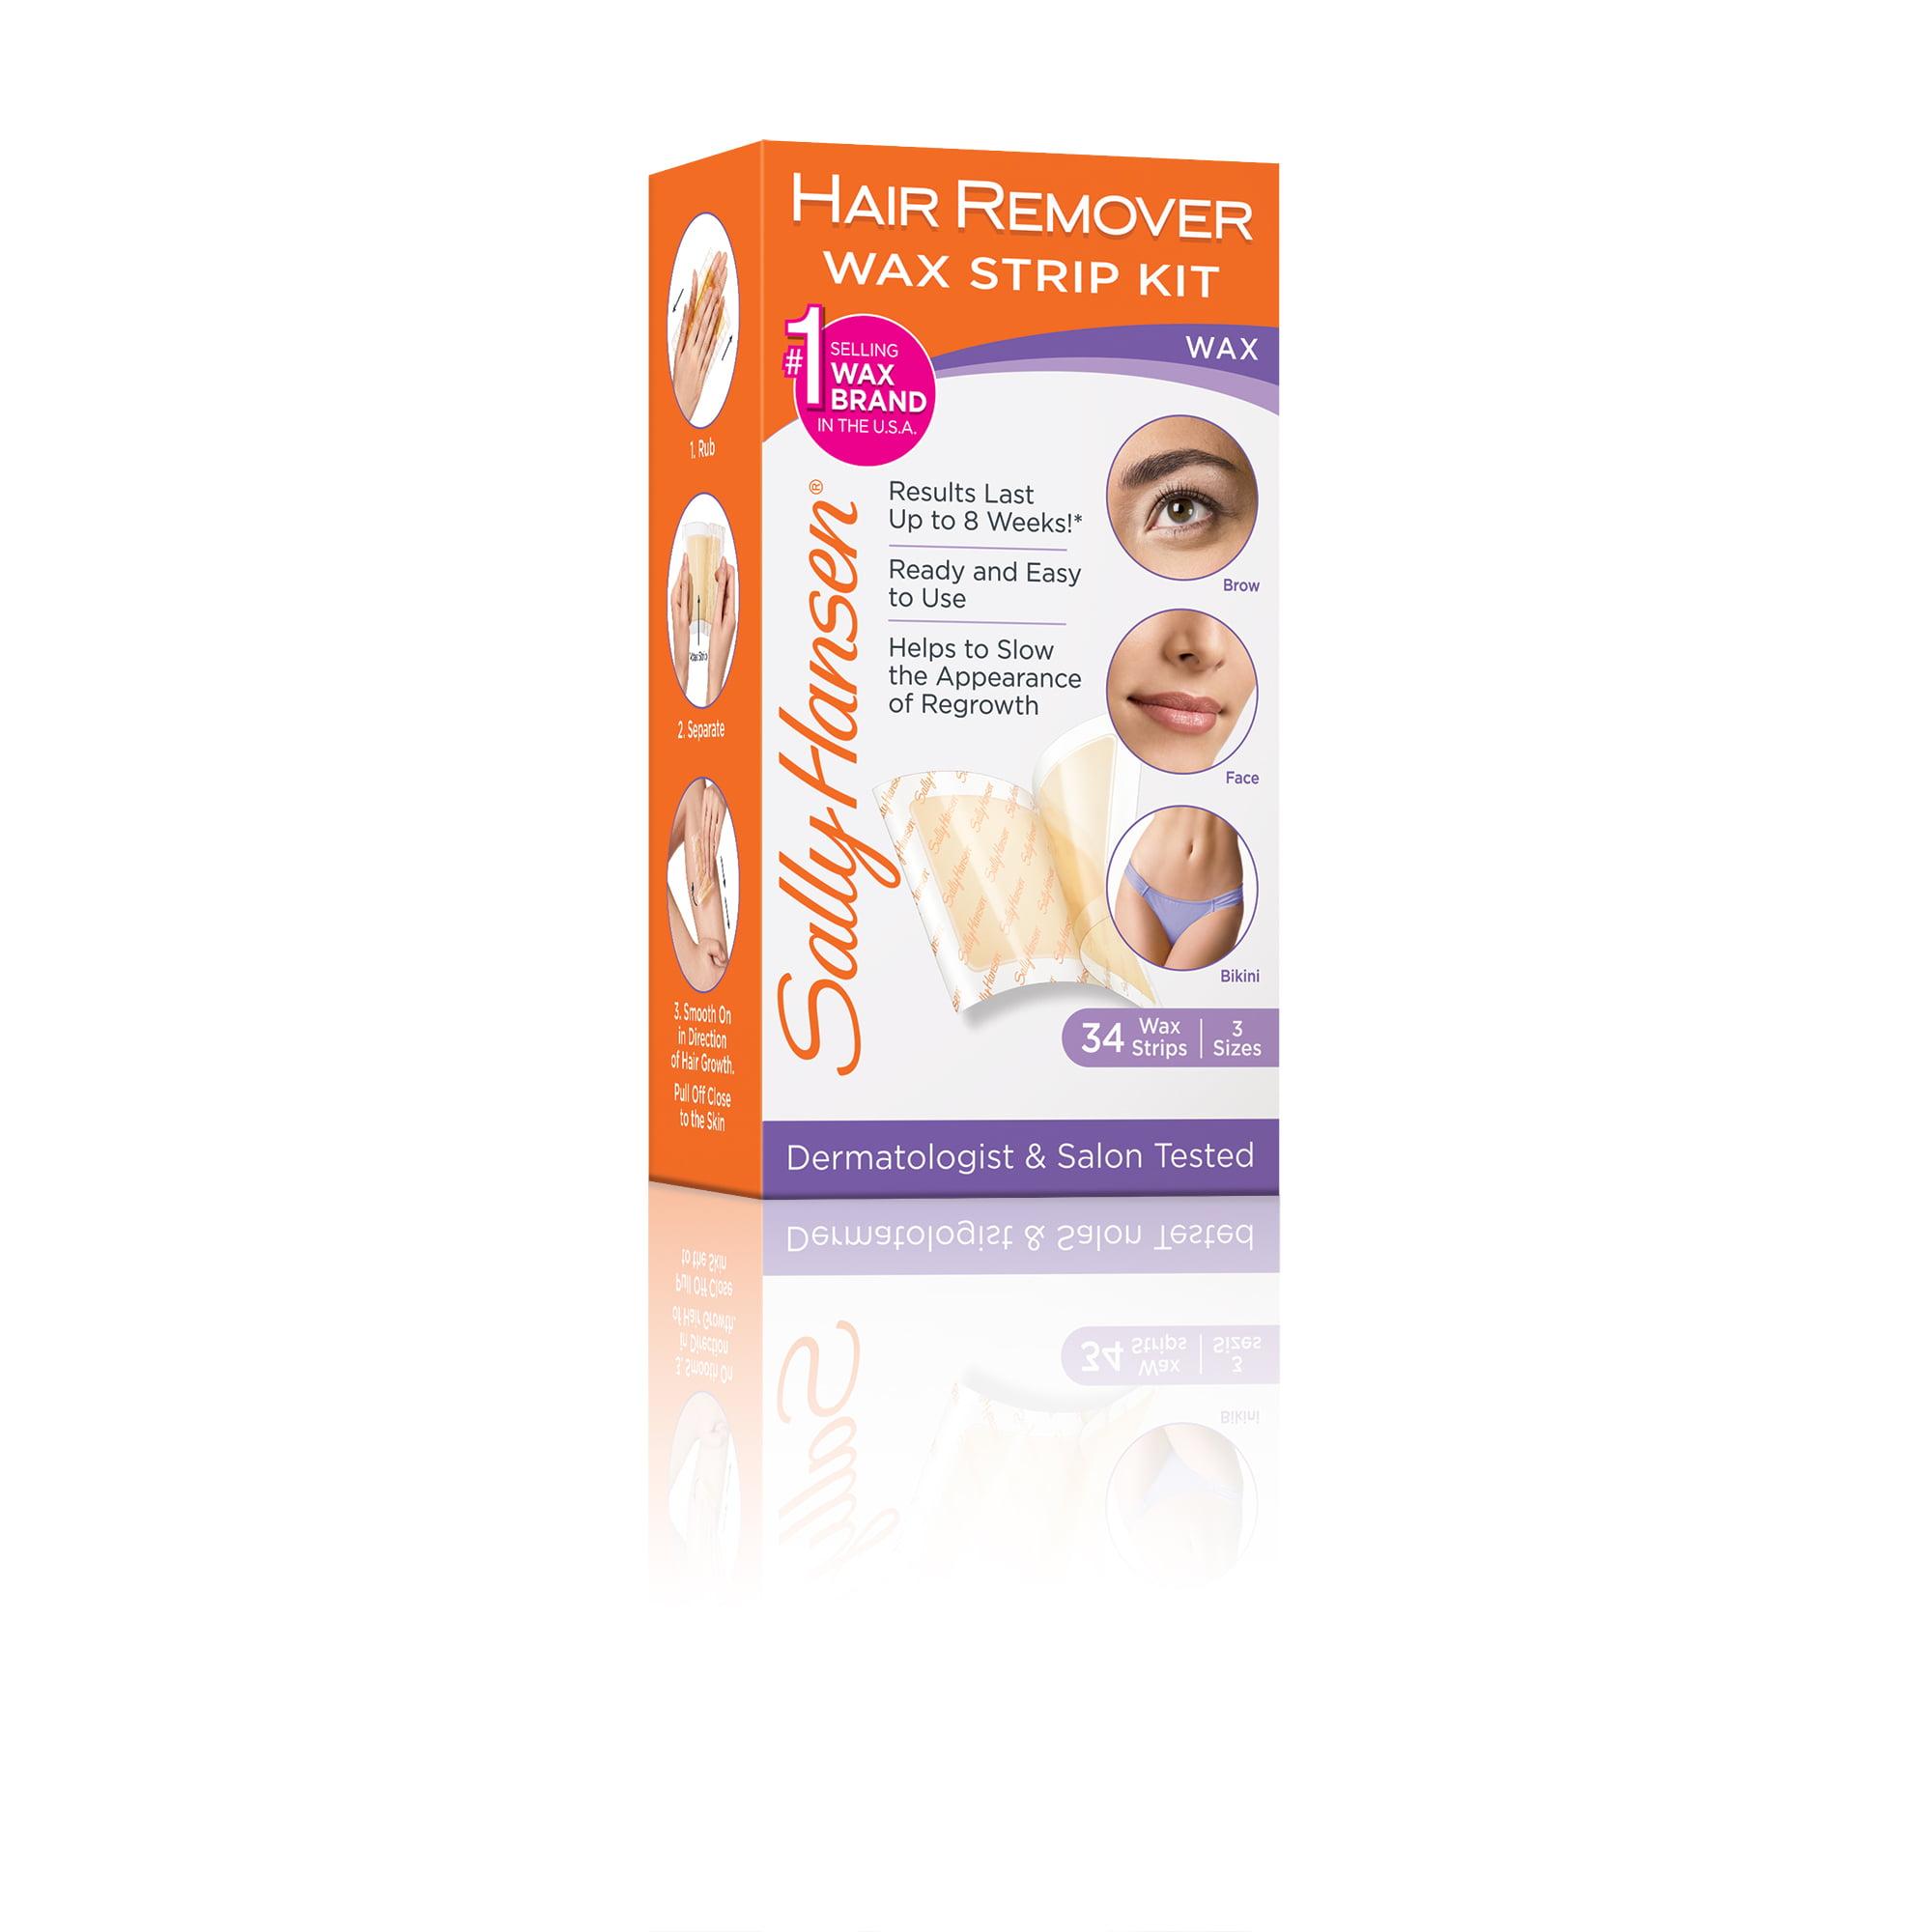 Sally Hansen Hair Remover Wax Strip Kit for Face, Brows & Bikini, 34 Strips